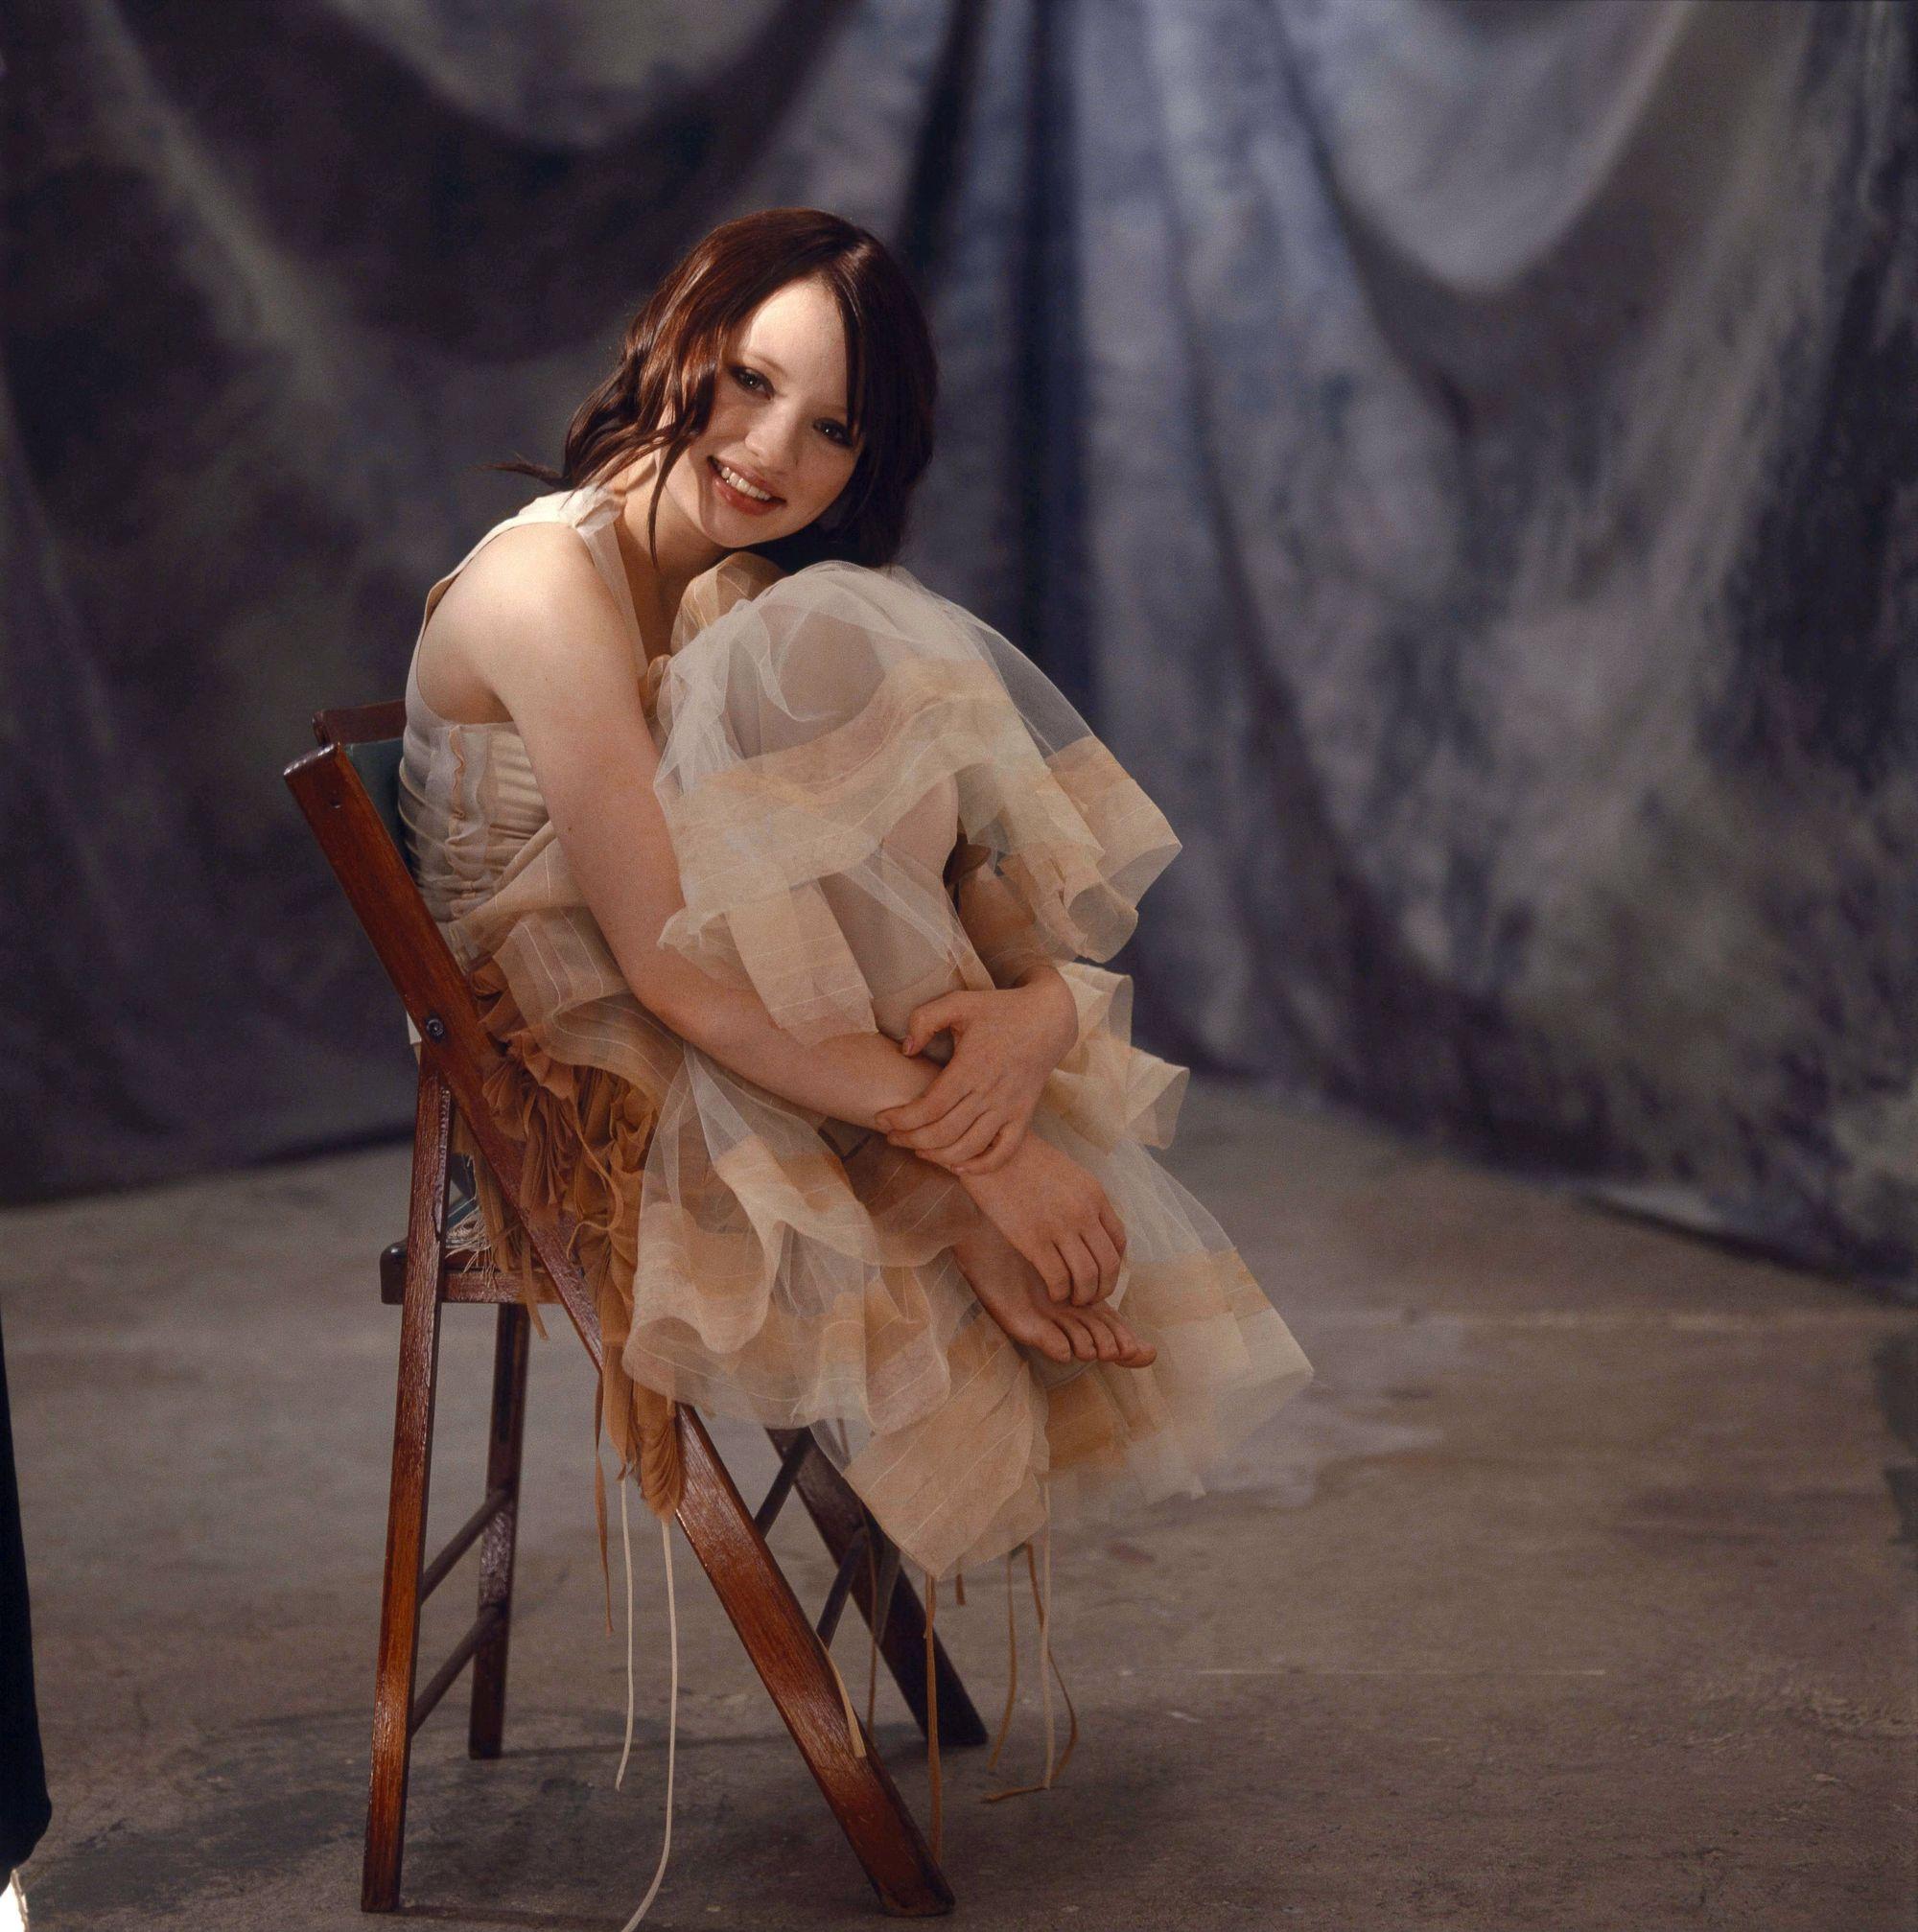 https://pics.wikifeet.com/Emily-Browning-Feet-222380.jpg